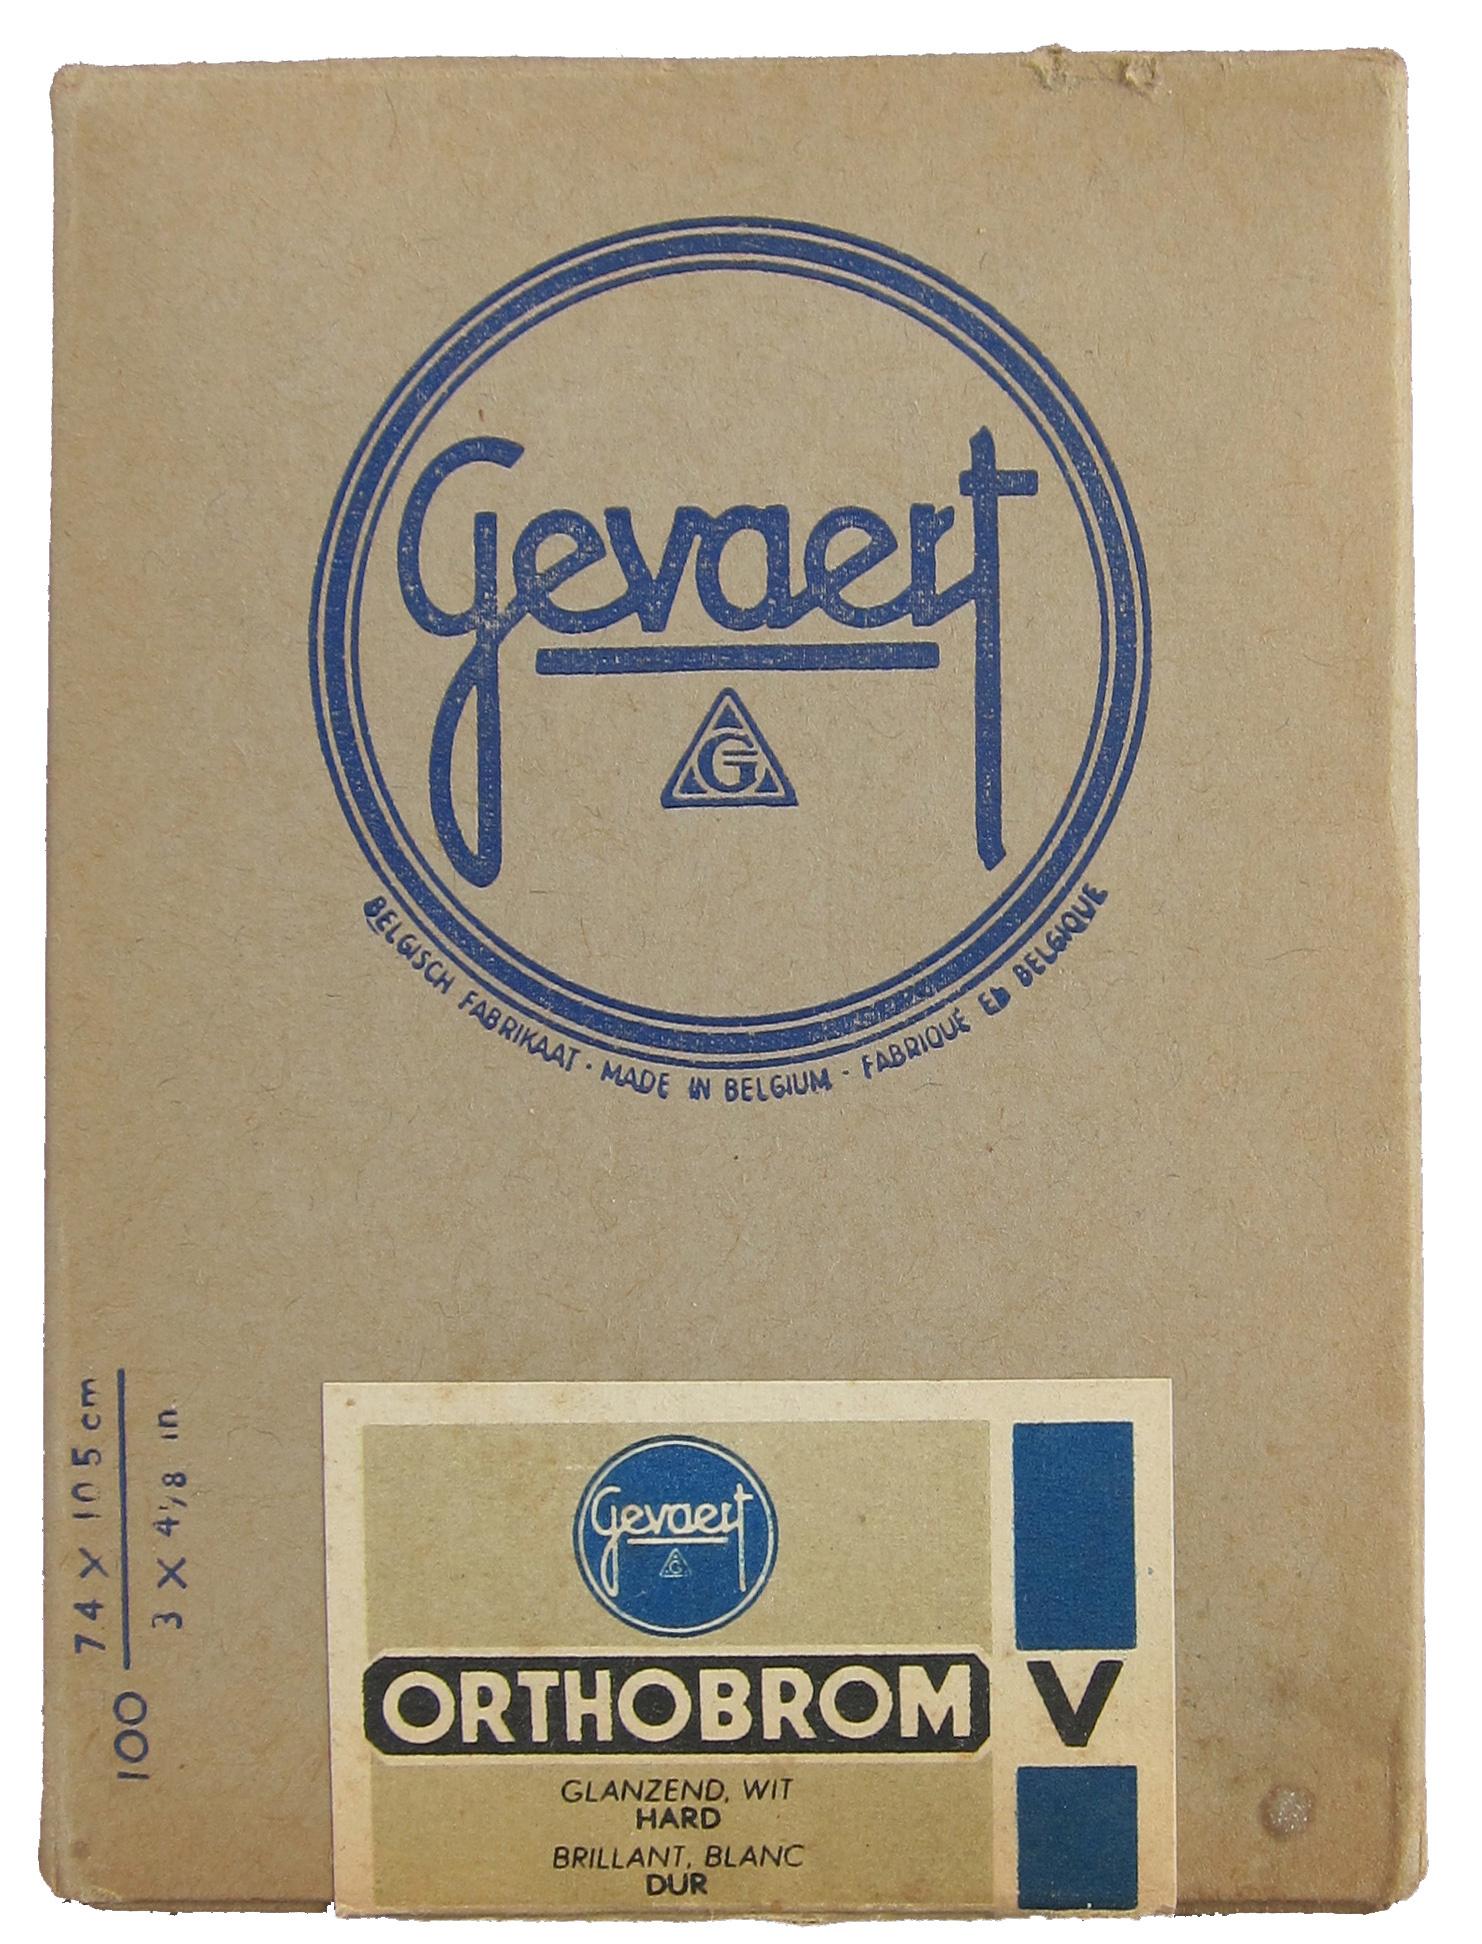 Font used in the original Gevaert logo? : identifythisfont